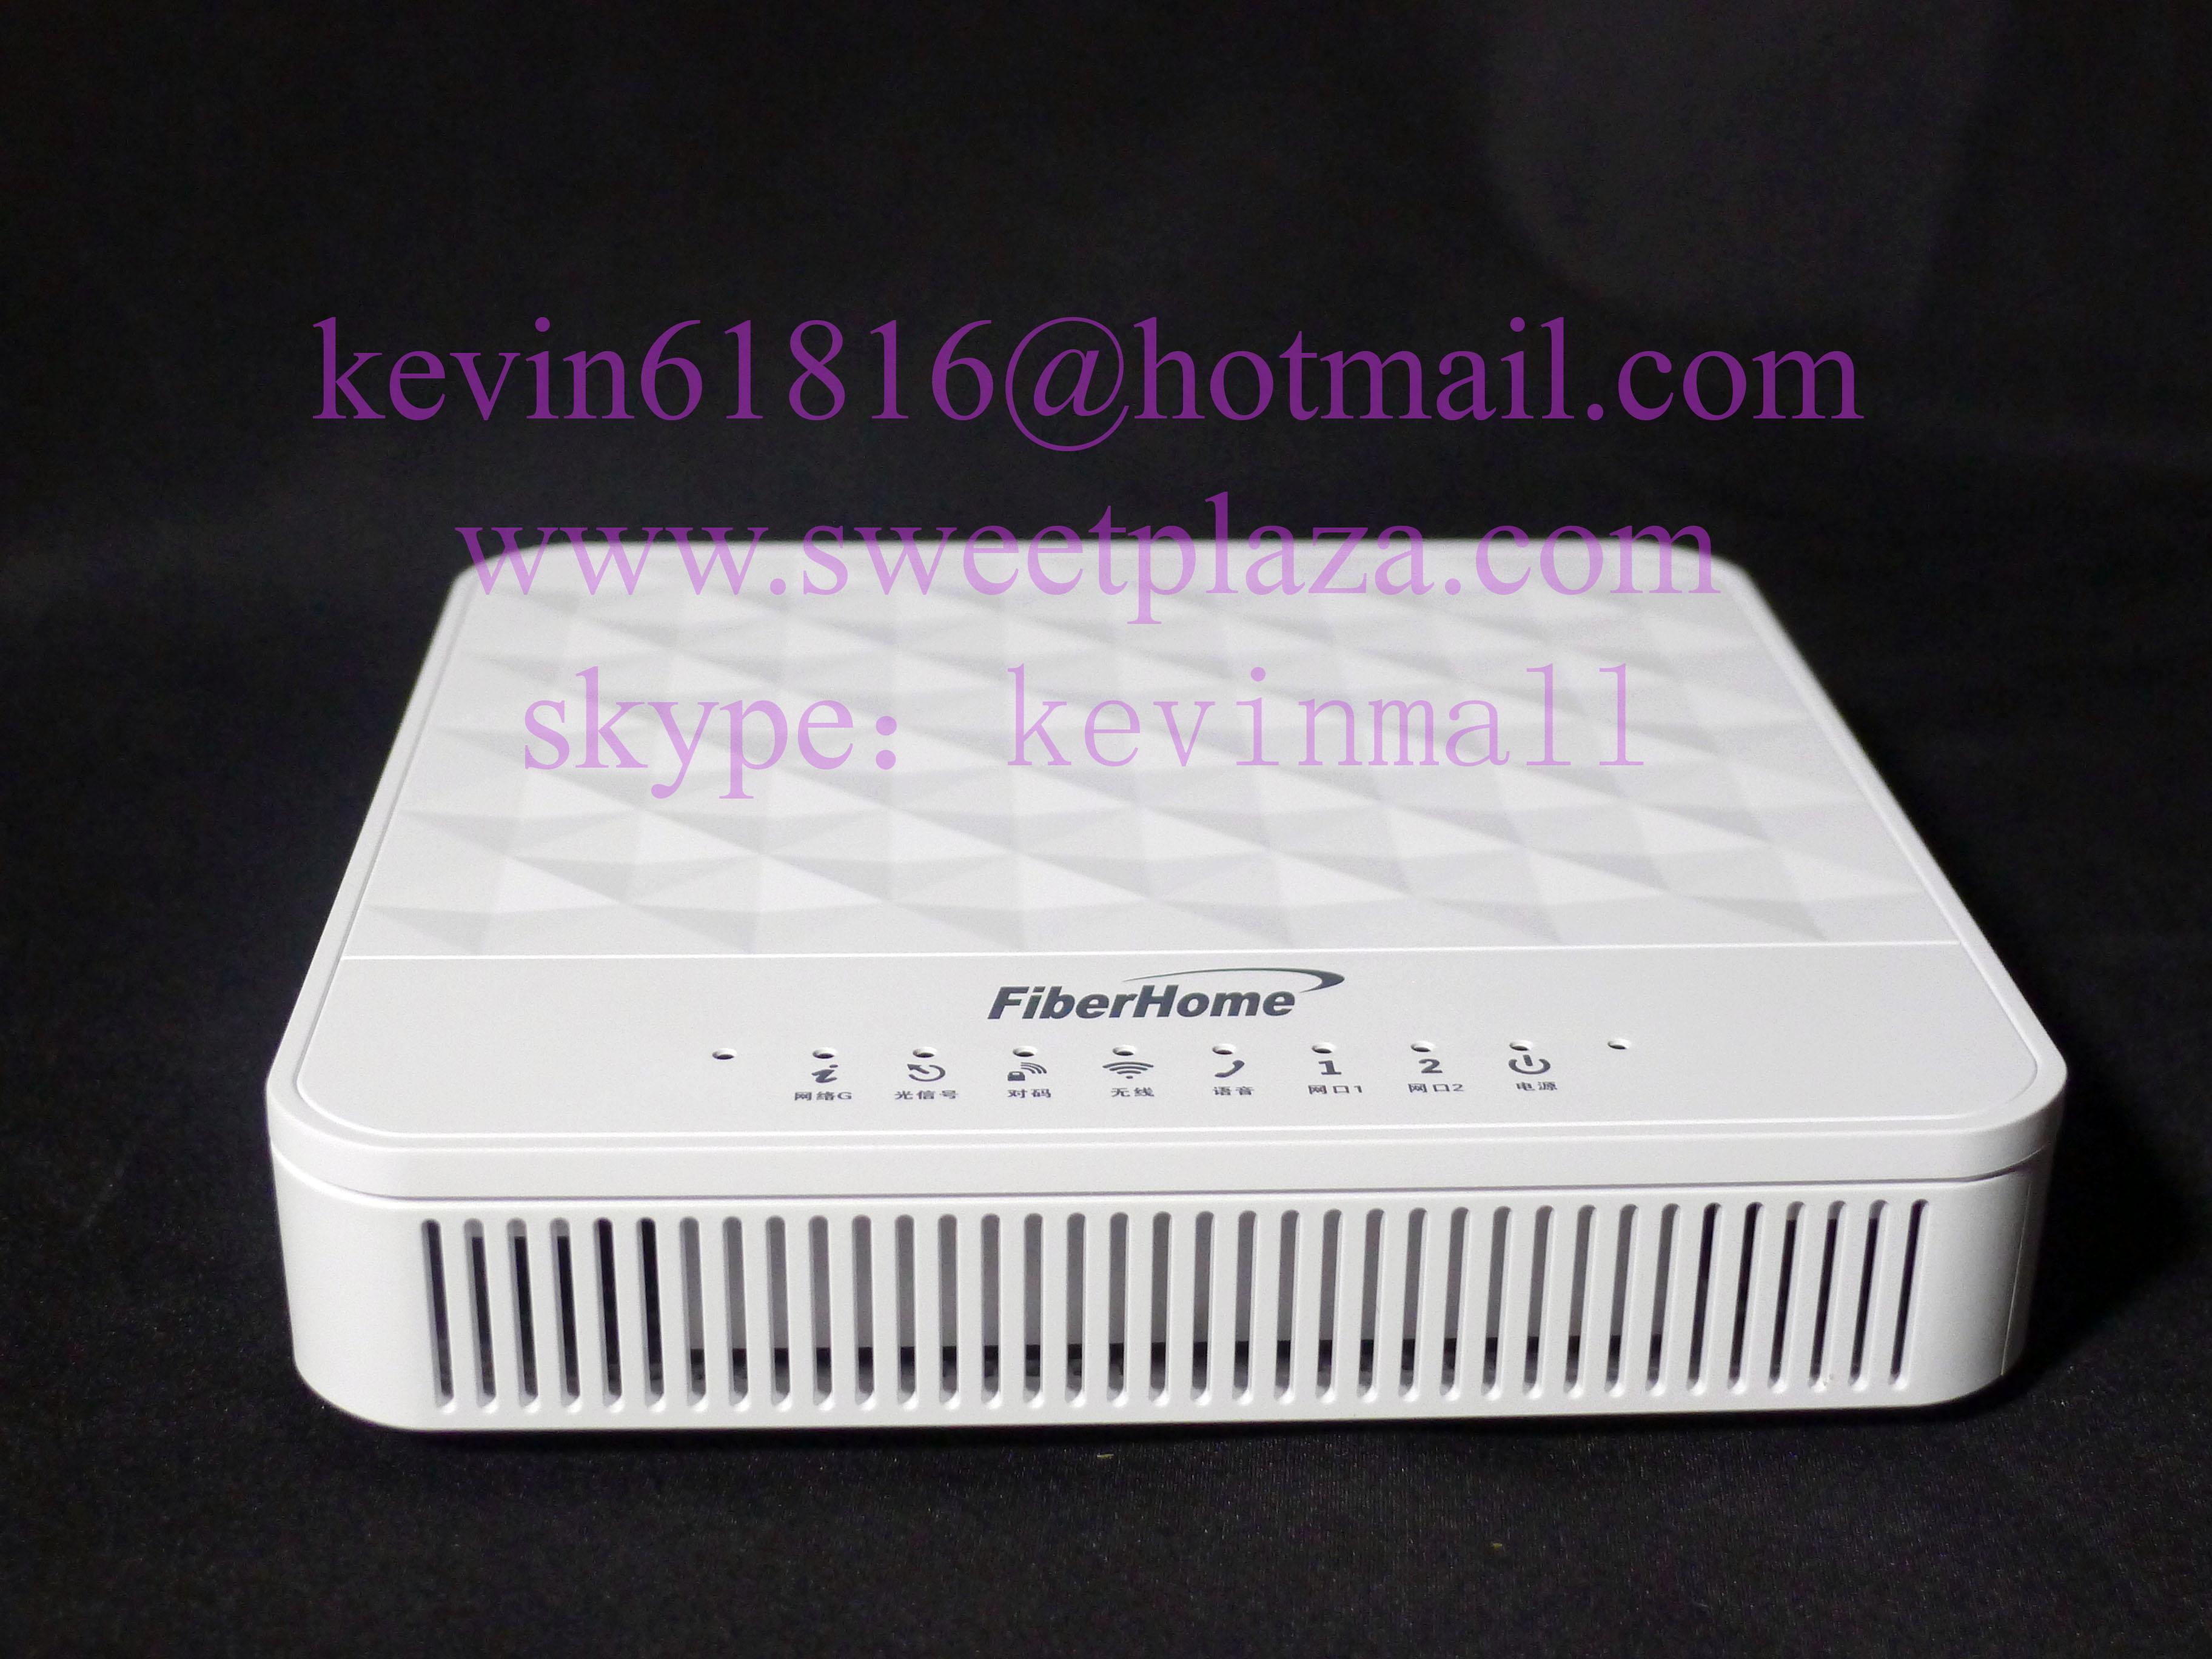 Fiberhome AN5506-02-FG GPON ONU optical network unit apply to FTTH FTTO  modems, 2 internet ports+1 phone port+wifi, white colour